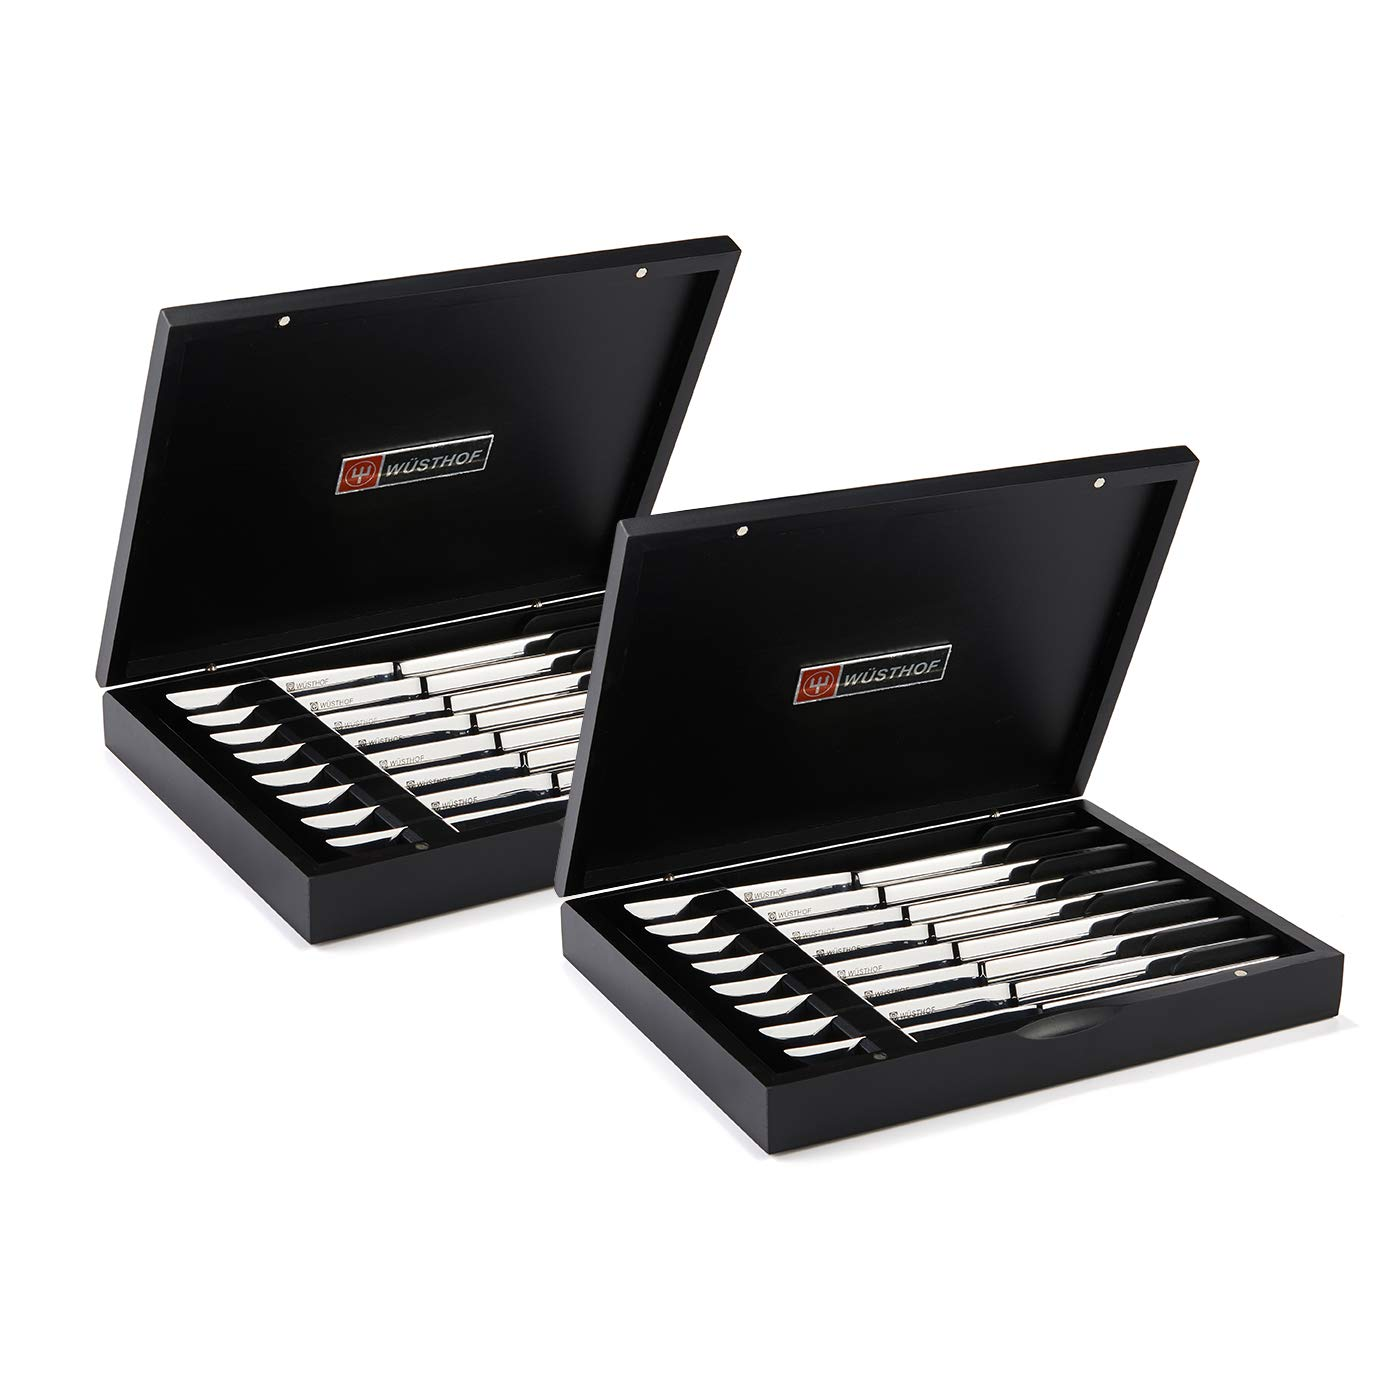 Wusthof Stainless Steel Eight Piece Steak Knife Set (2, STAINLESS EIGHT PIECE STEAK KNIFE SET IN BLACK CHE)